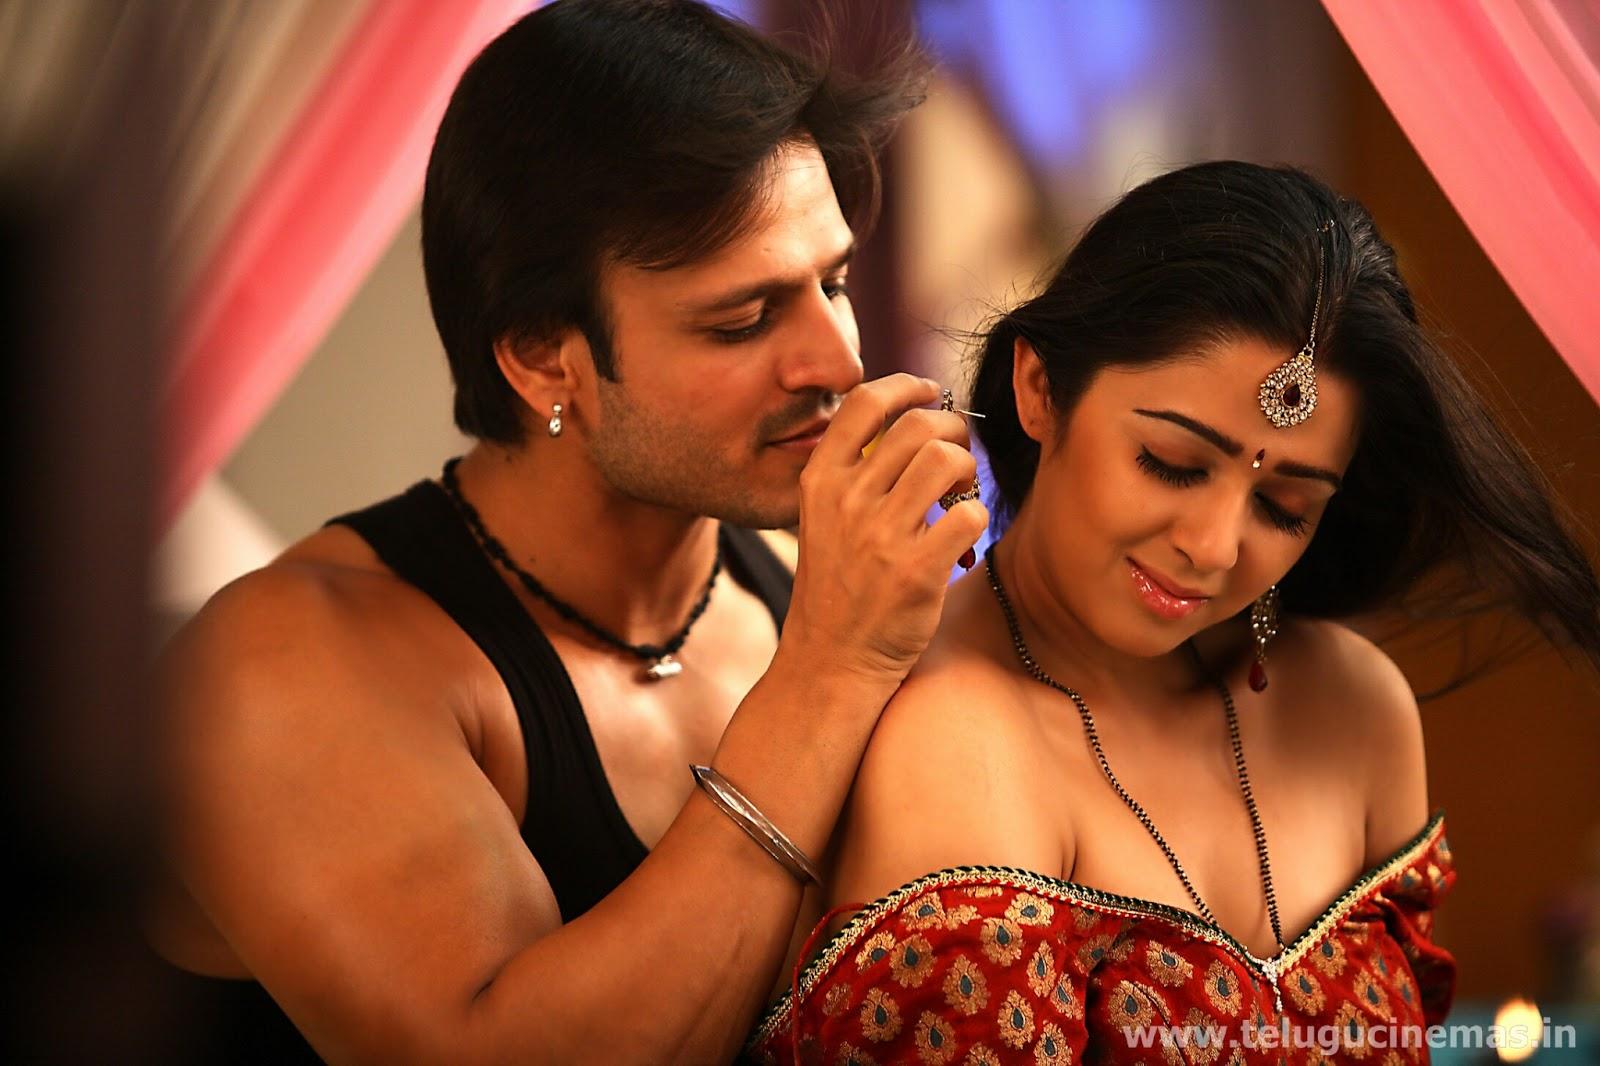 Charmi-romance-with-Vivek-Oberoi-in-Zilla-Ghaziabad-TeluguCinemas.in__agla2c কিভাবে বুঝবেন আপনার সঙ্গি সেক্সে ইচ্ছুক কি না ,জানুন